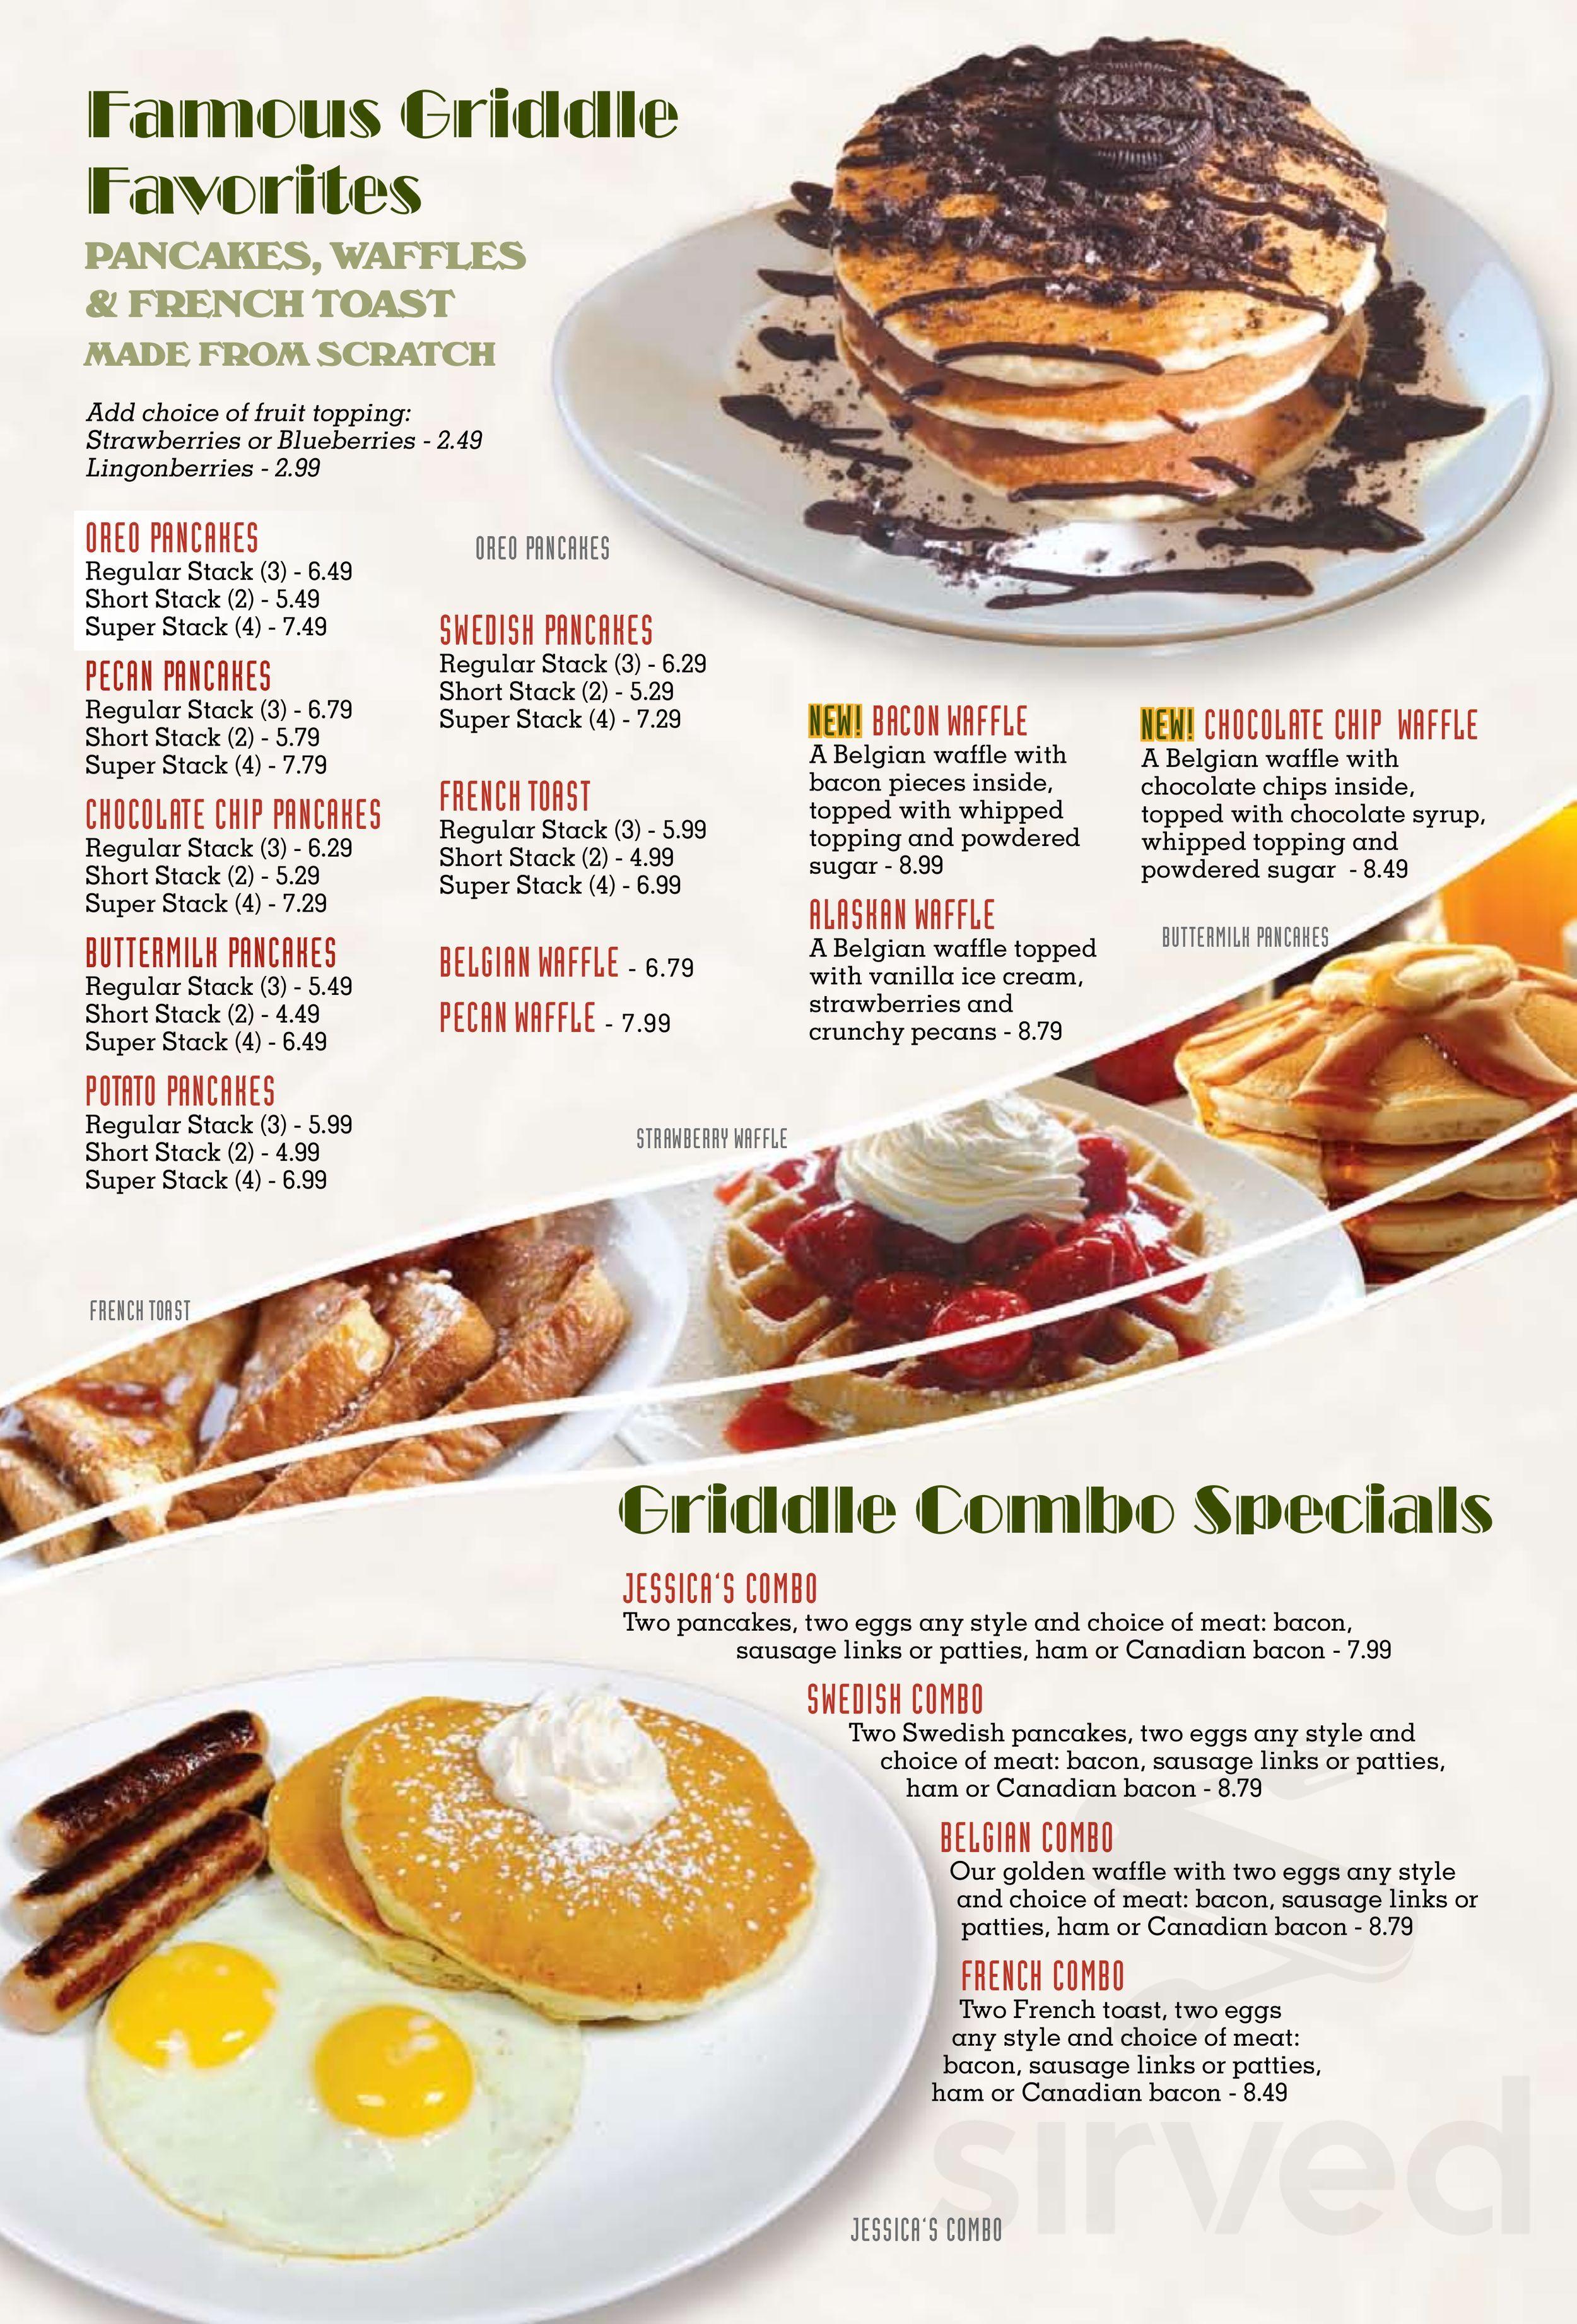 Jessica's Restaurant menu in Roscoe, Illinois, USA